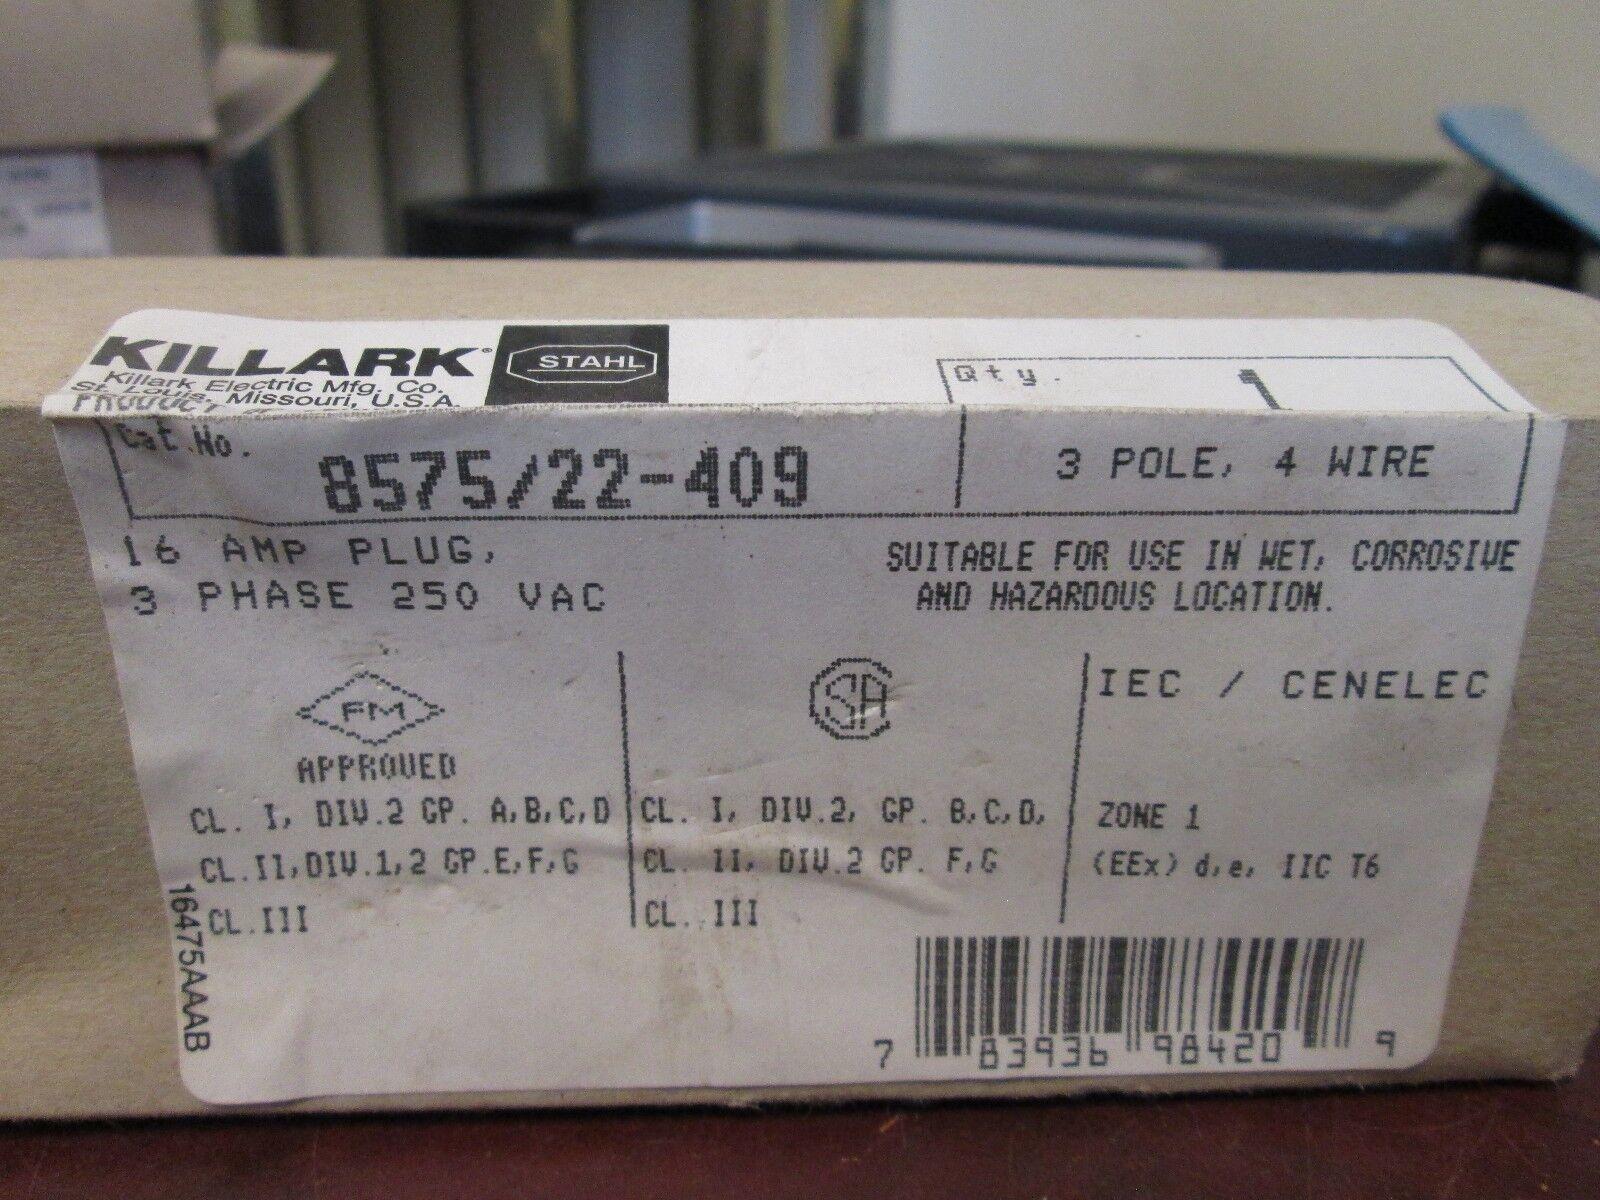 Killark Plug 8575//22-409 16A 250VAC 3P 4W 3Ph New Surplus